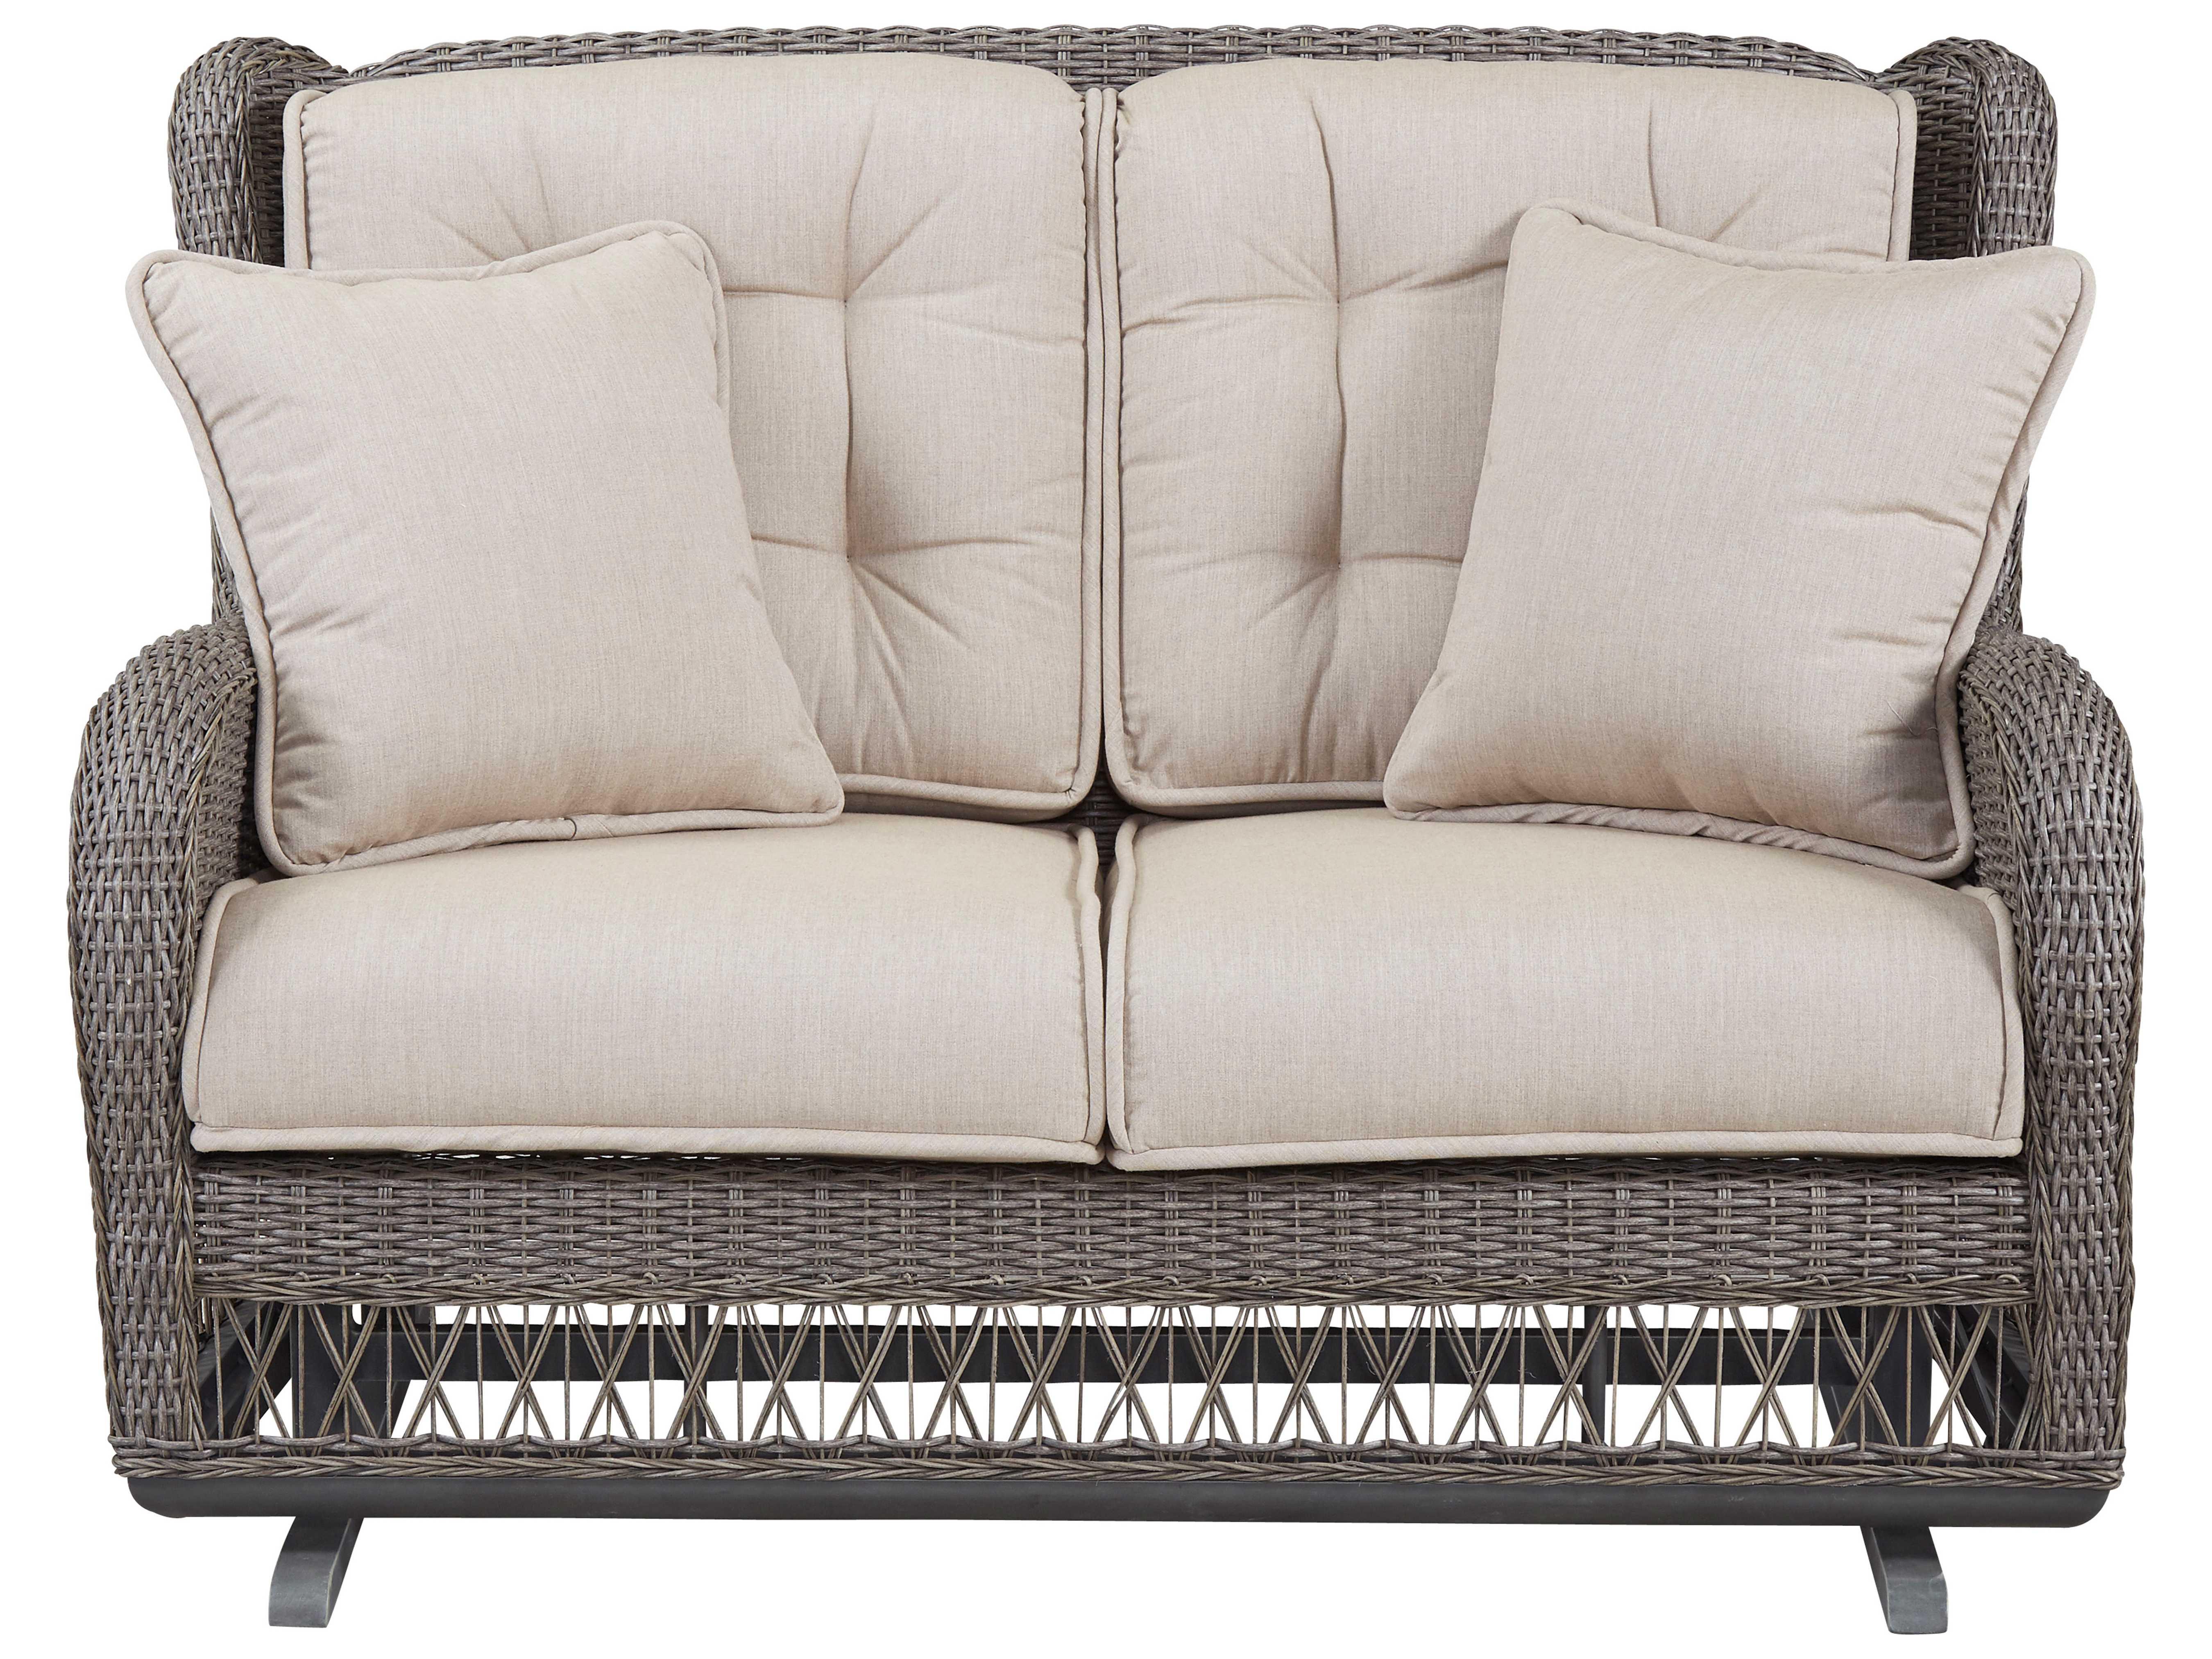 glider sofa danish style sofas paula deen outdoor dogwood wicker loveseat 17003889